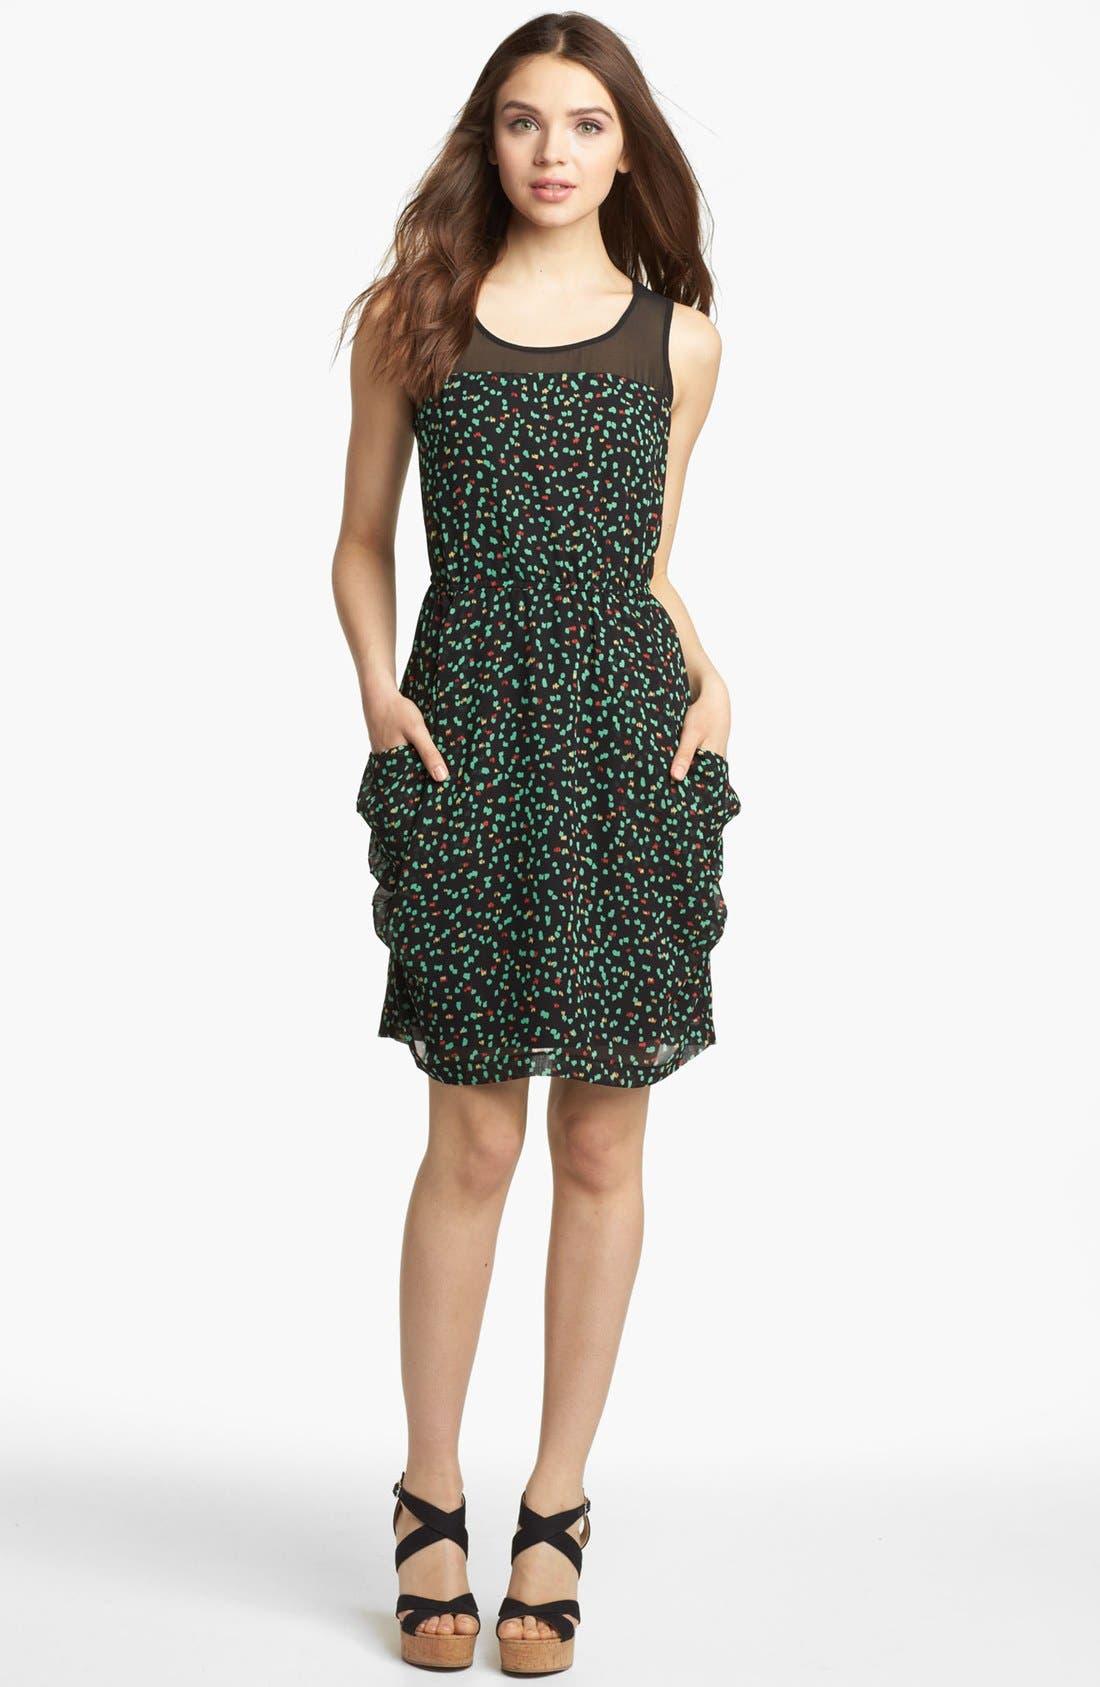 Alternate Image 1 Selected - Kensie 'Sketched Spot' Dress